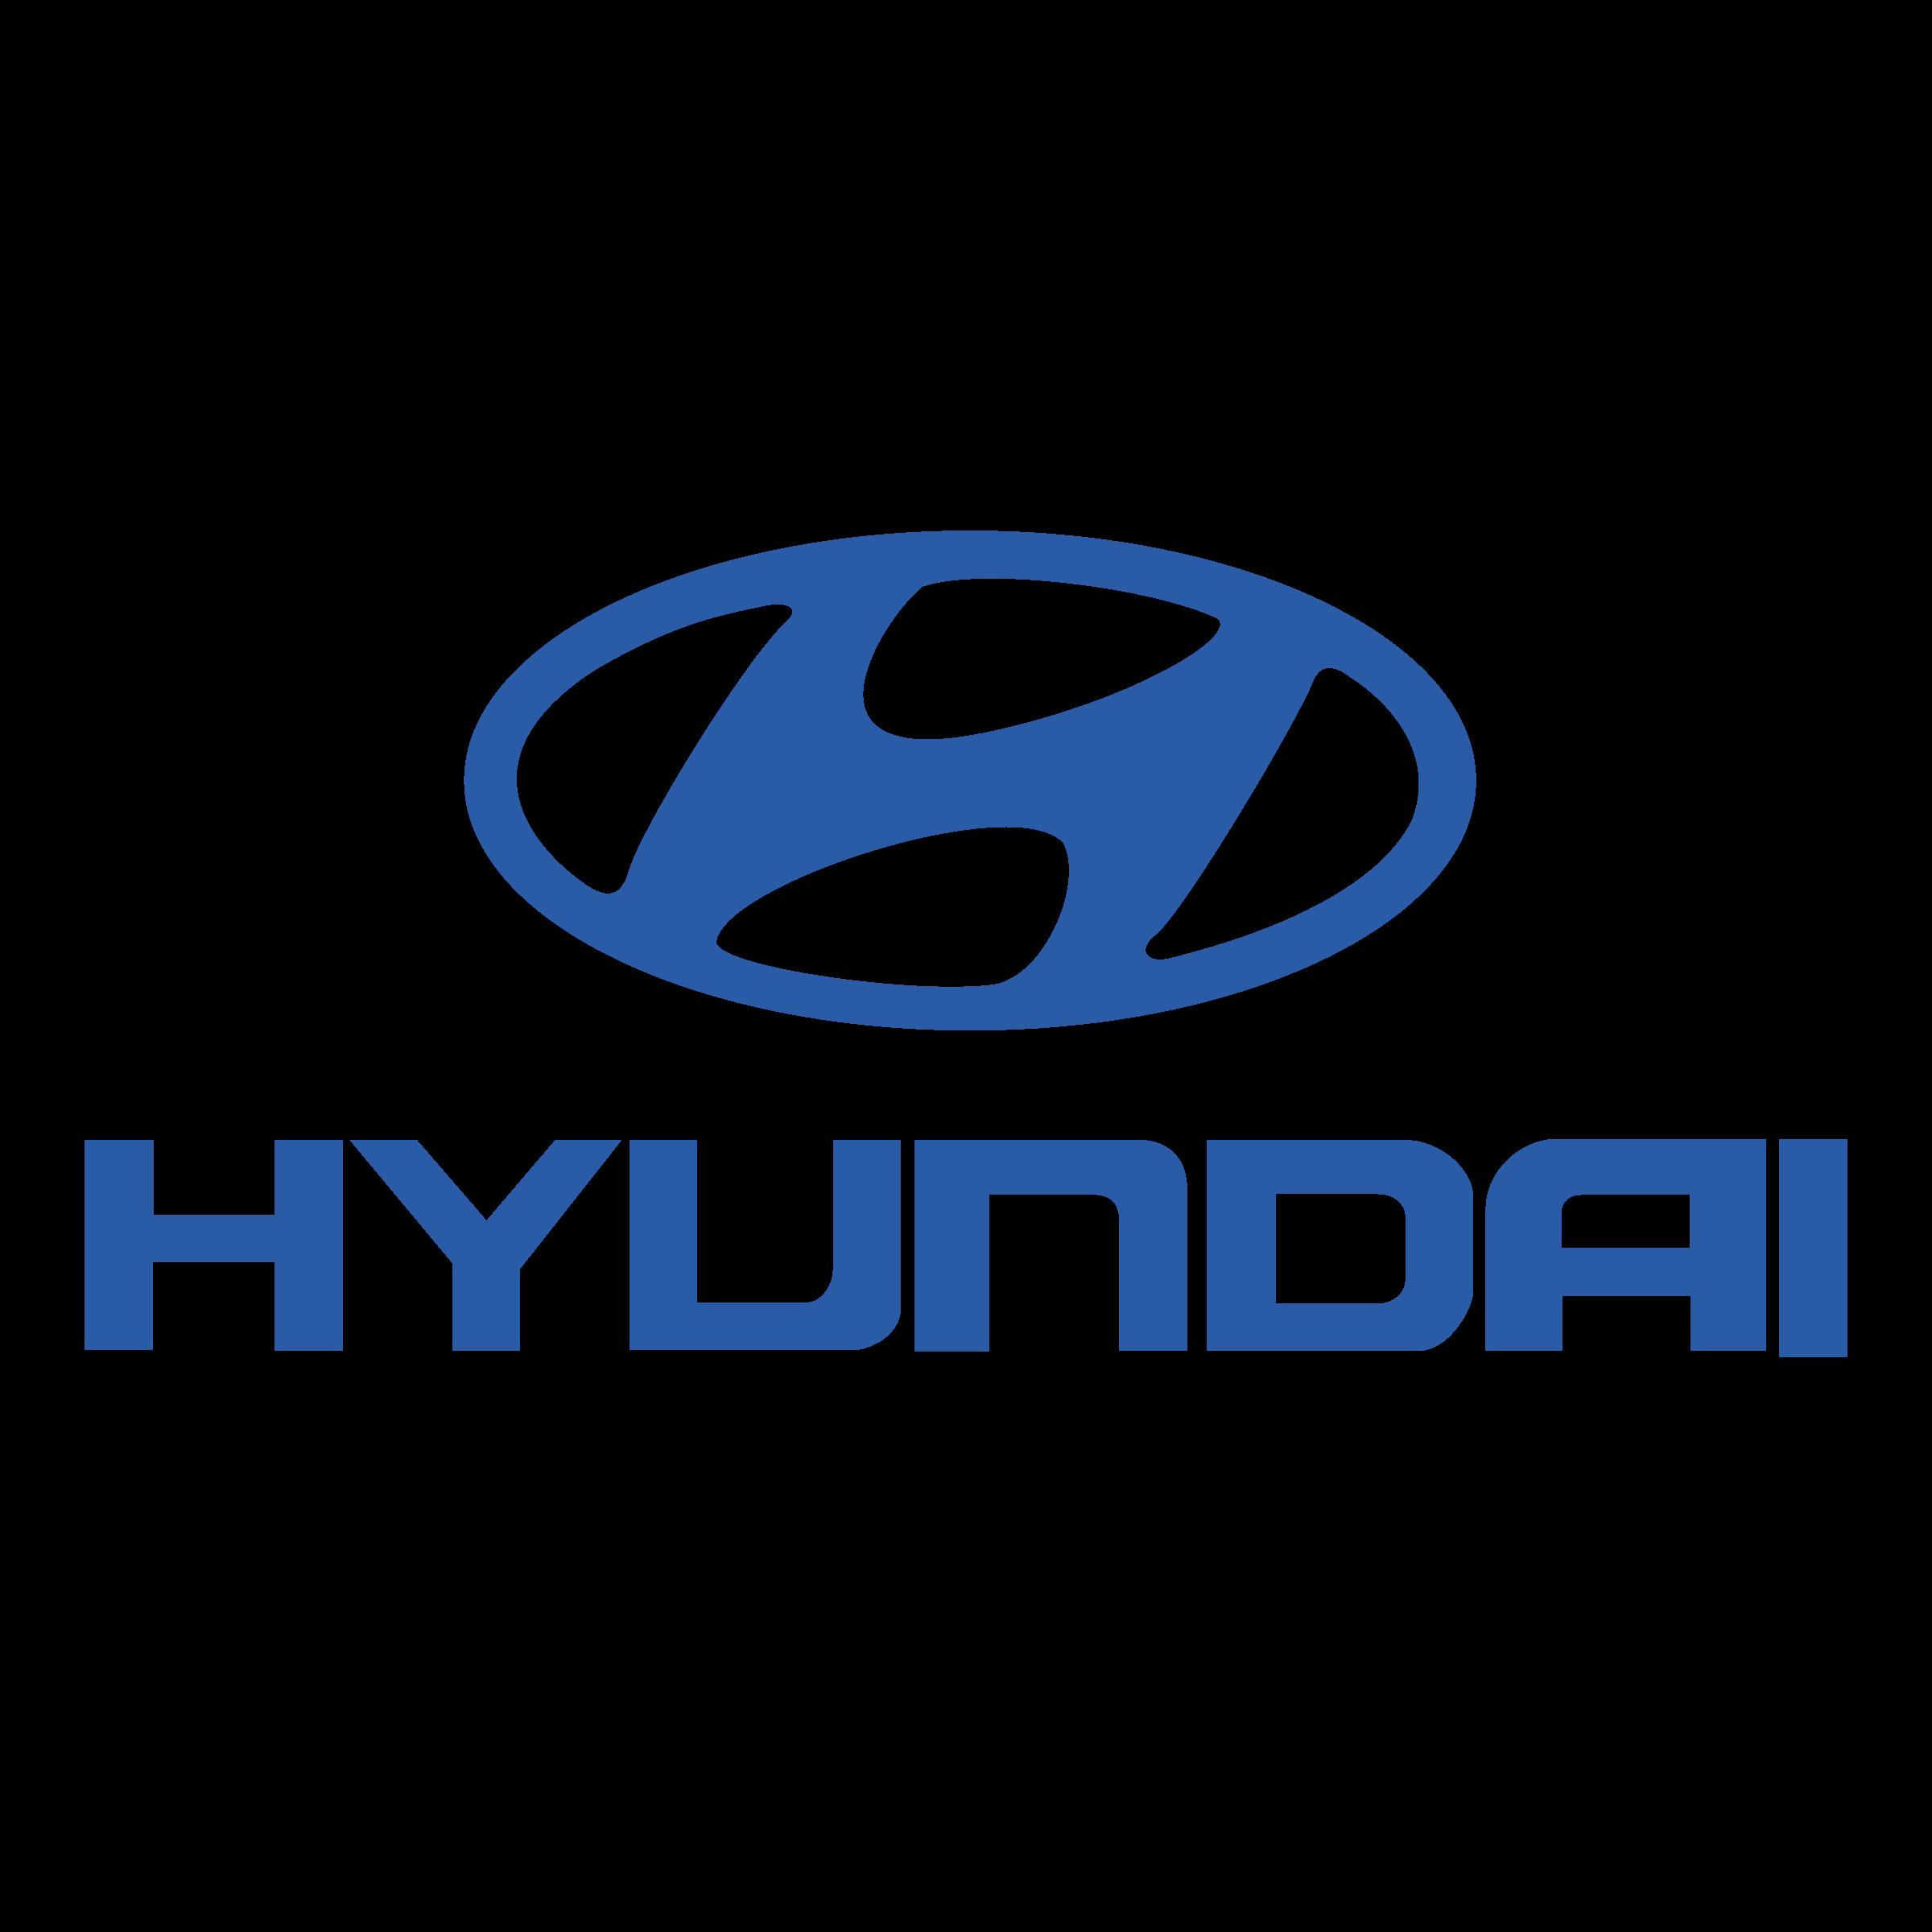 hyundai motor company logo png transparent amp svg vector